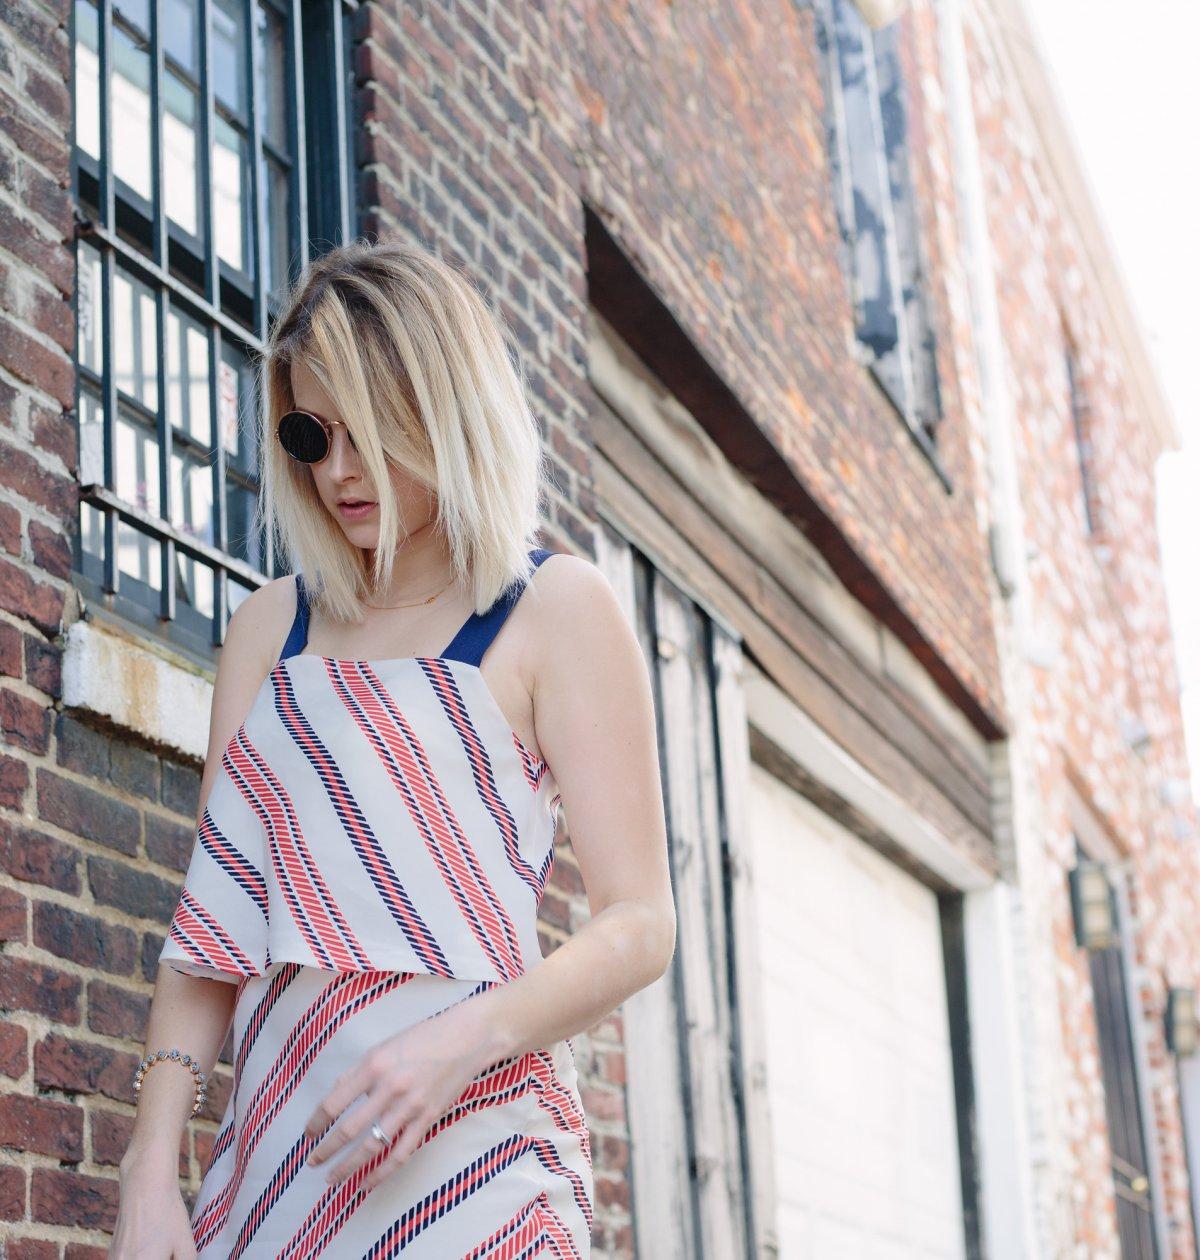 Pale Is The New Tan - www.viciloves.com - @viciloves1